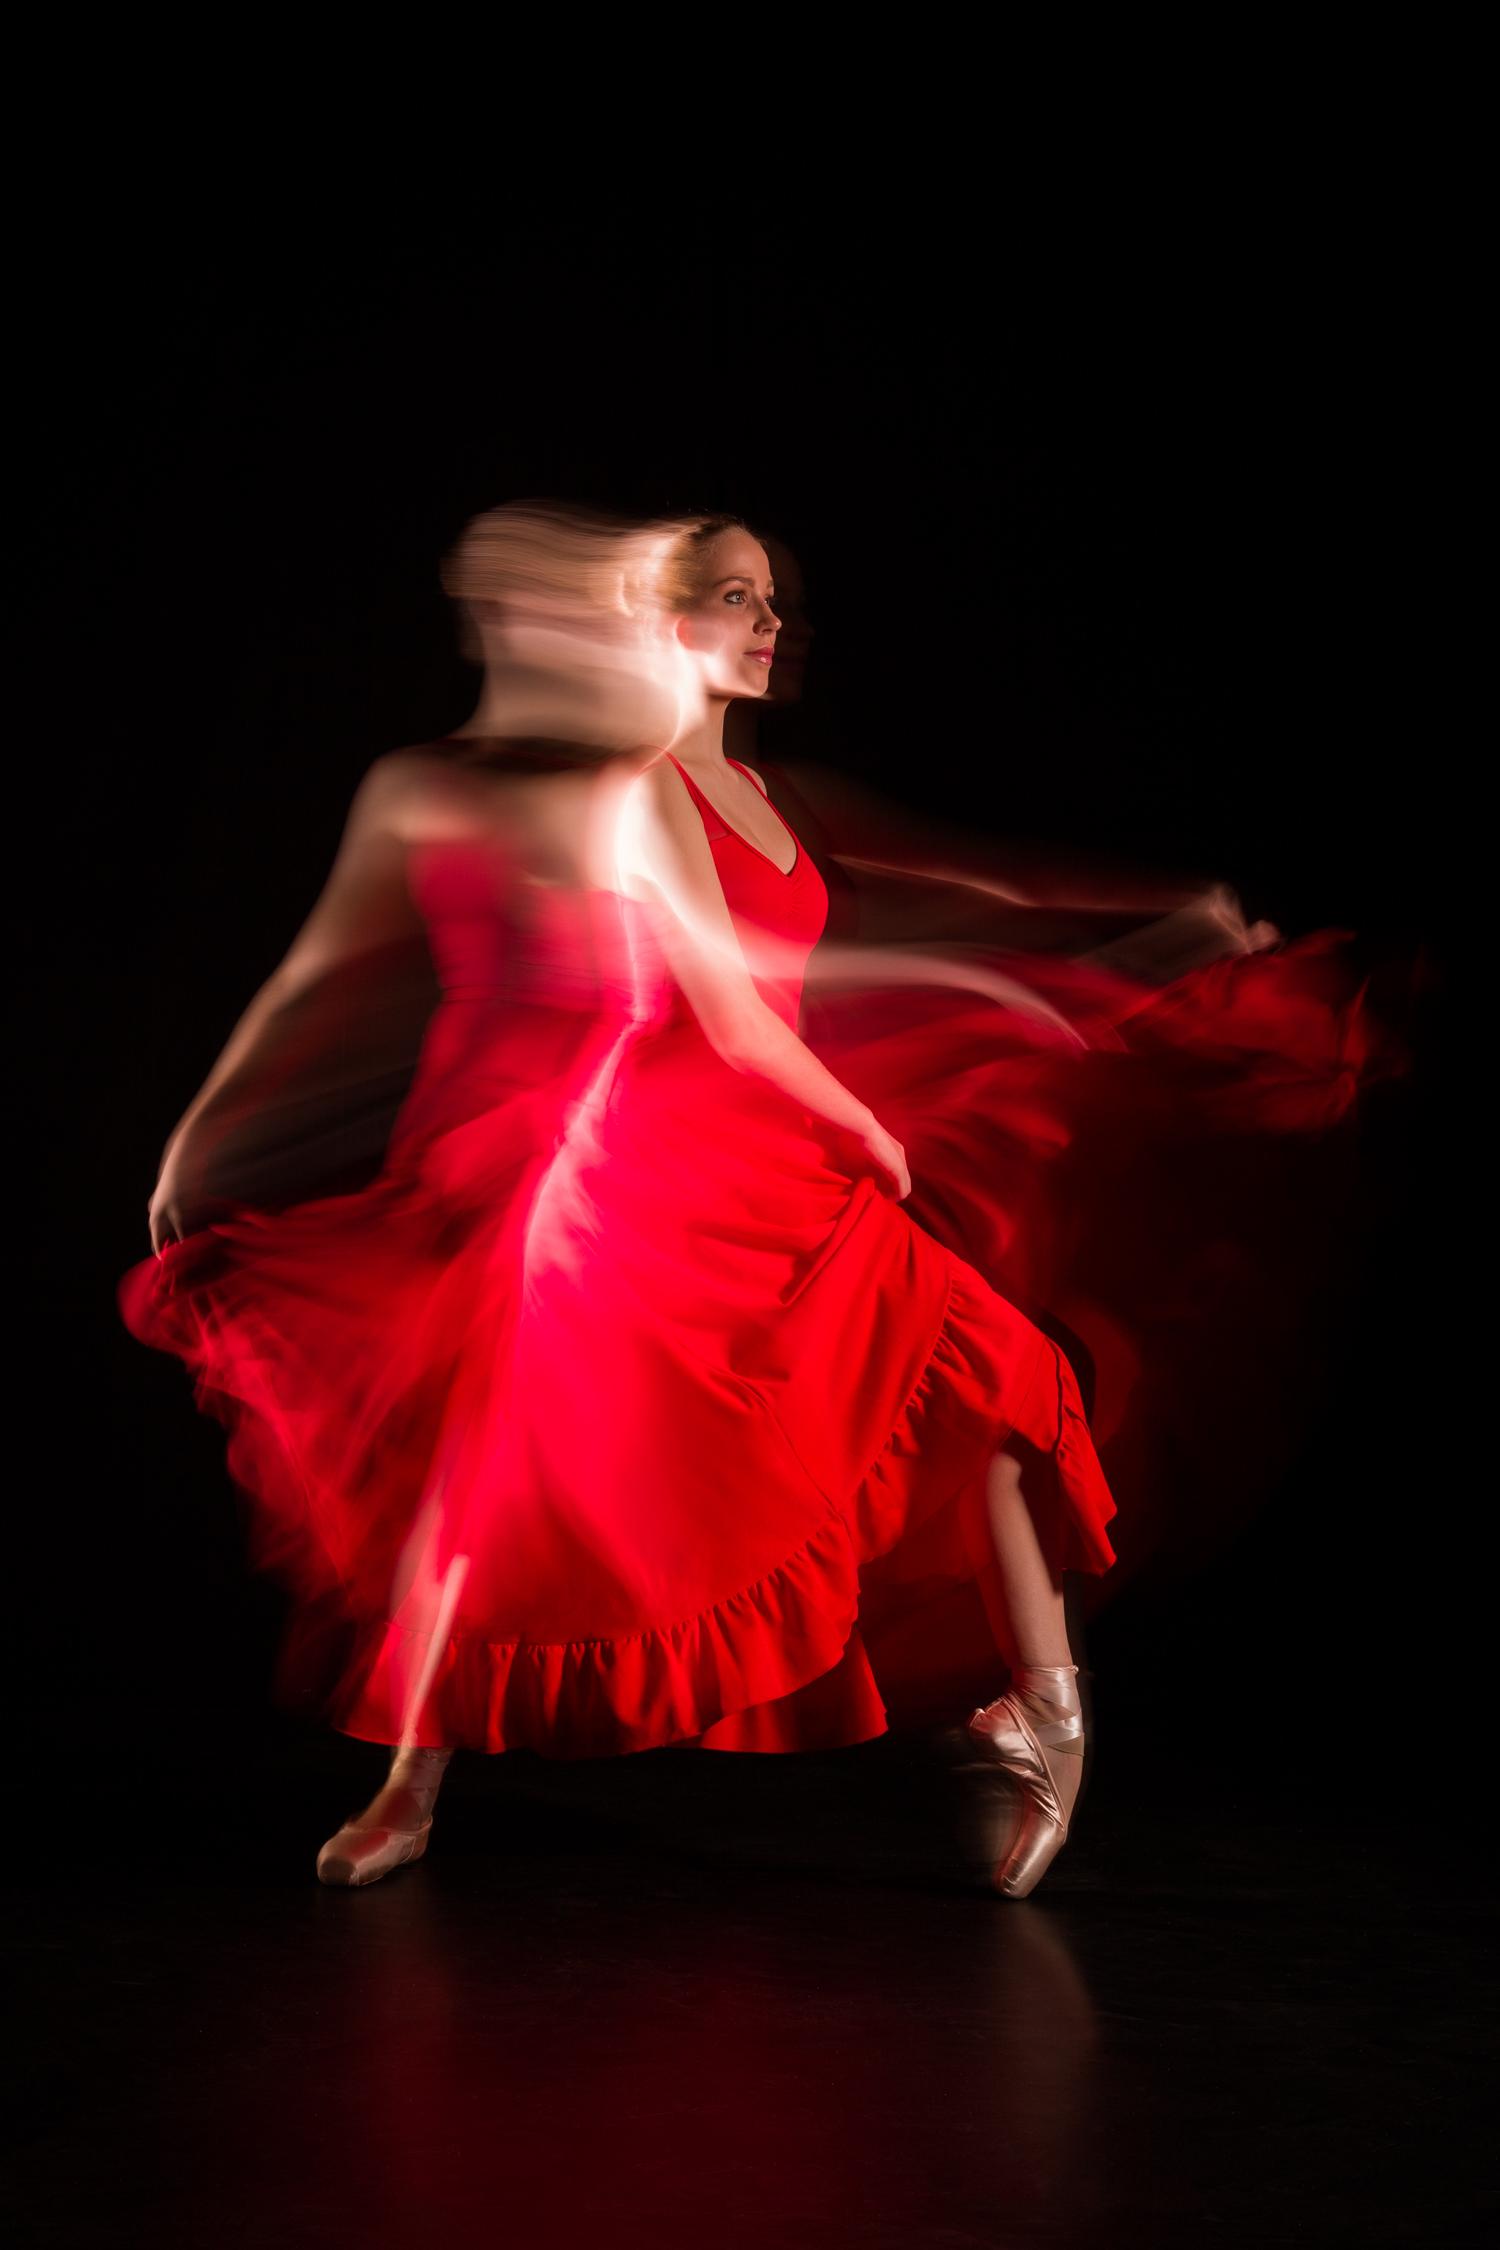 0118 Dance Shoot Veerle Studio Wartibo.jpg